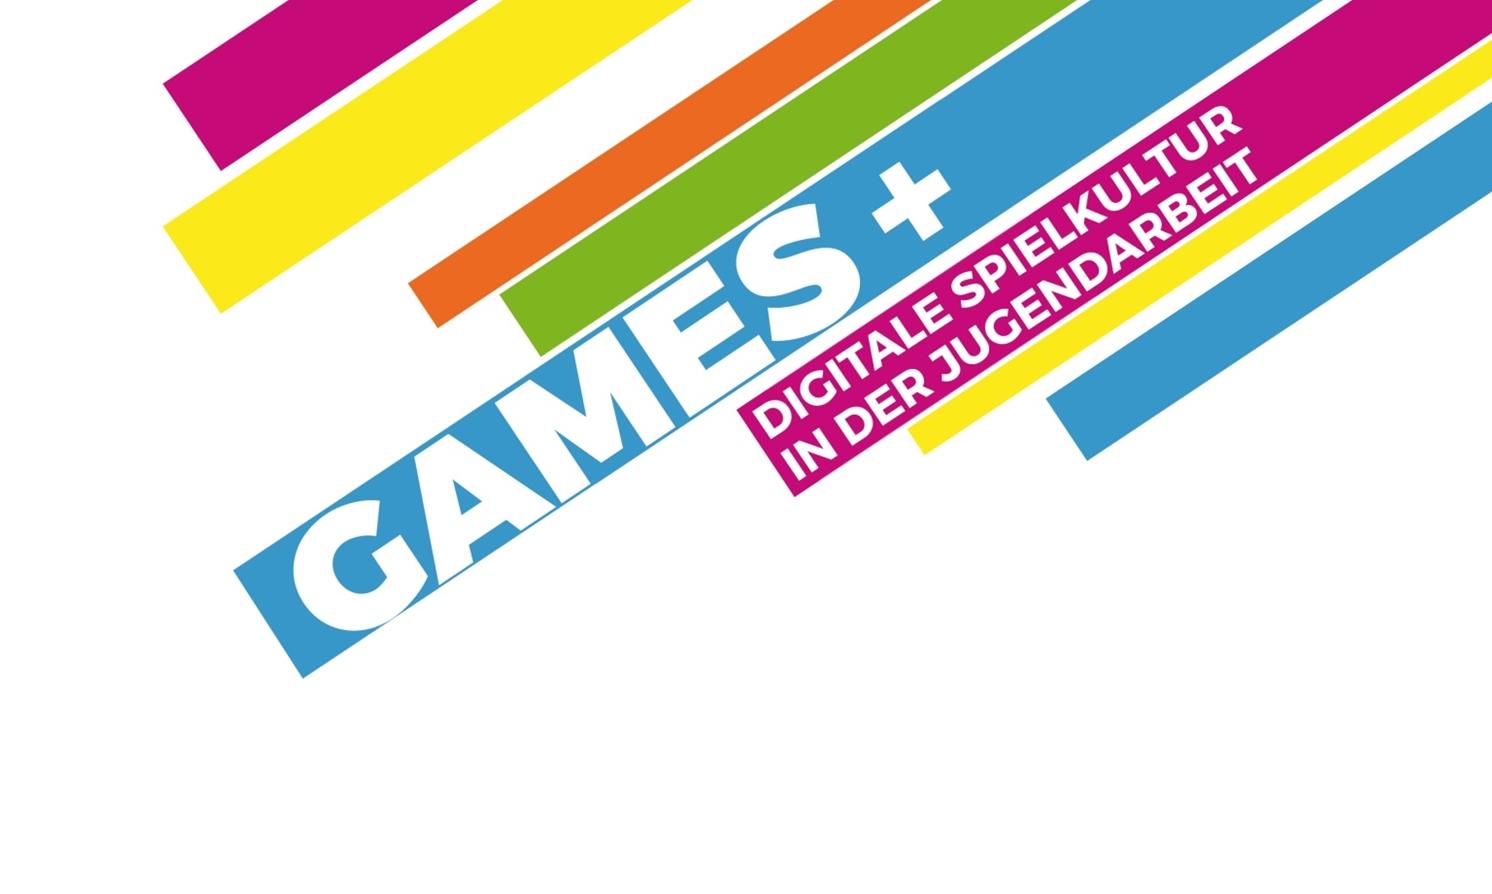 GAMES + DIGITALE SPIELKULTUR IN DER JUGENDARBEIT